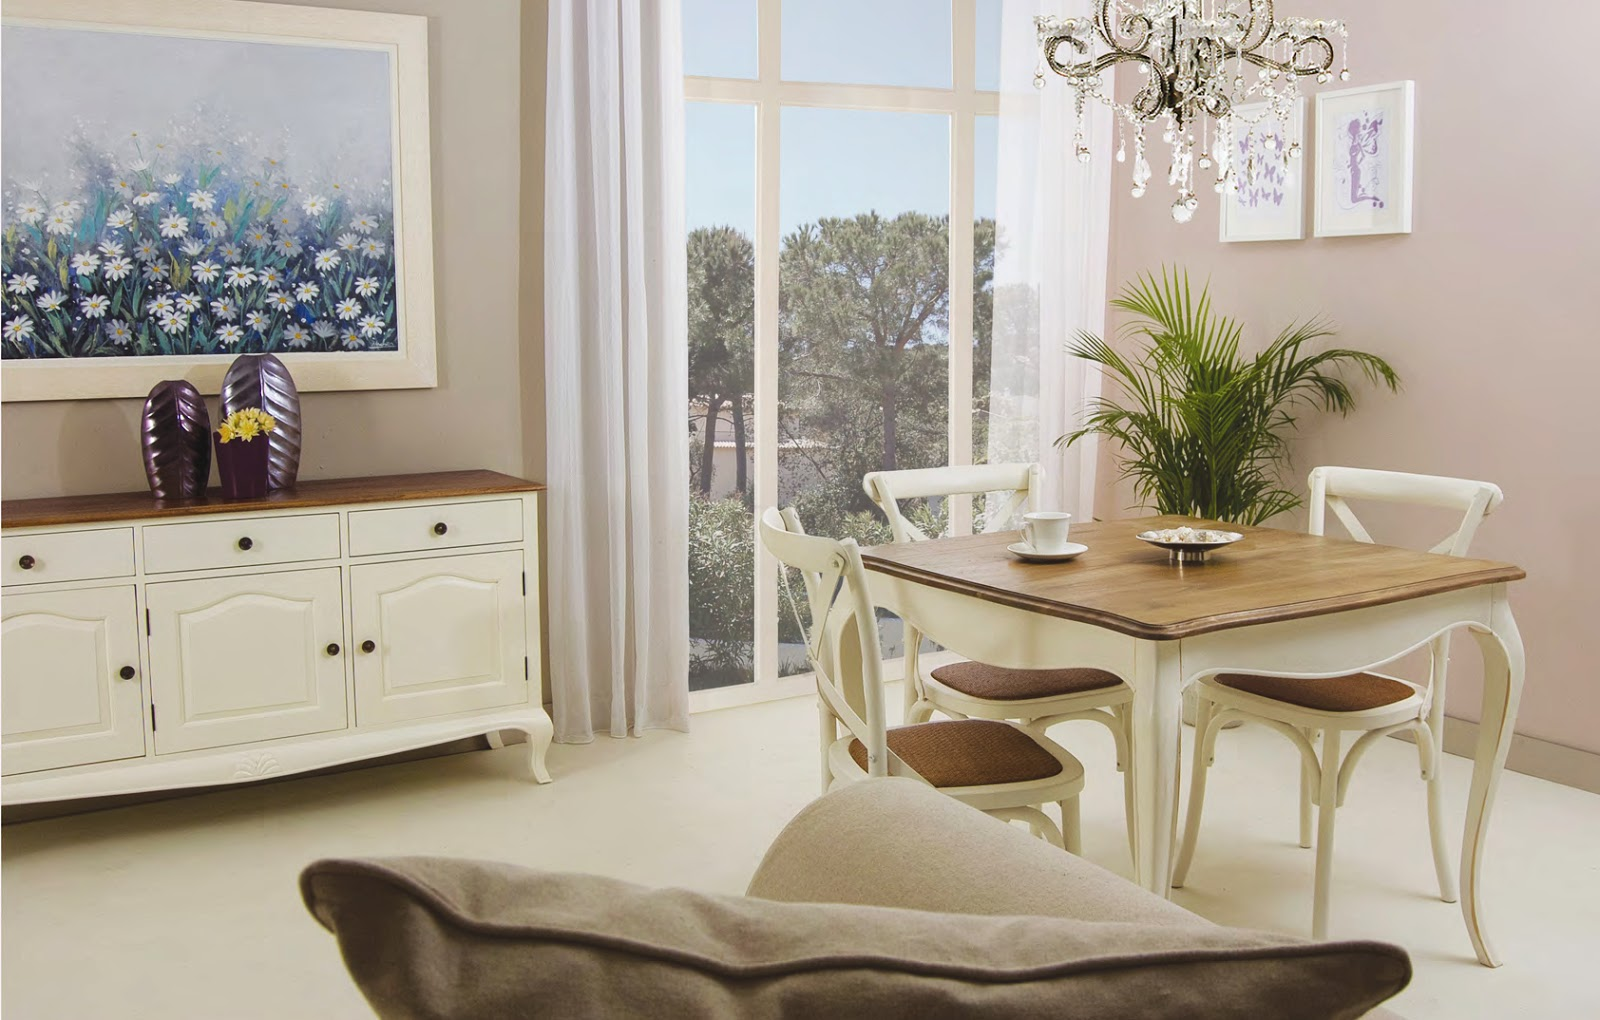 Aparador Estreito ~ Muebles de Comedor APARADORES PARA EL COMEDOR